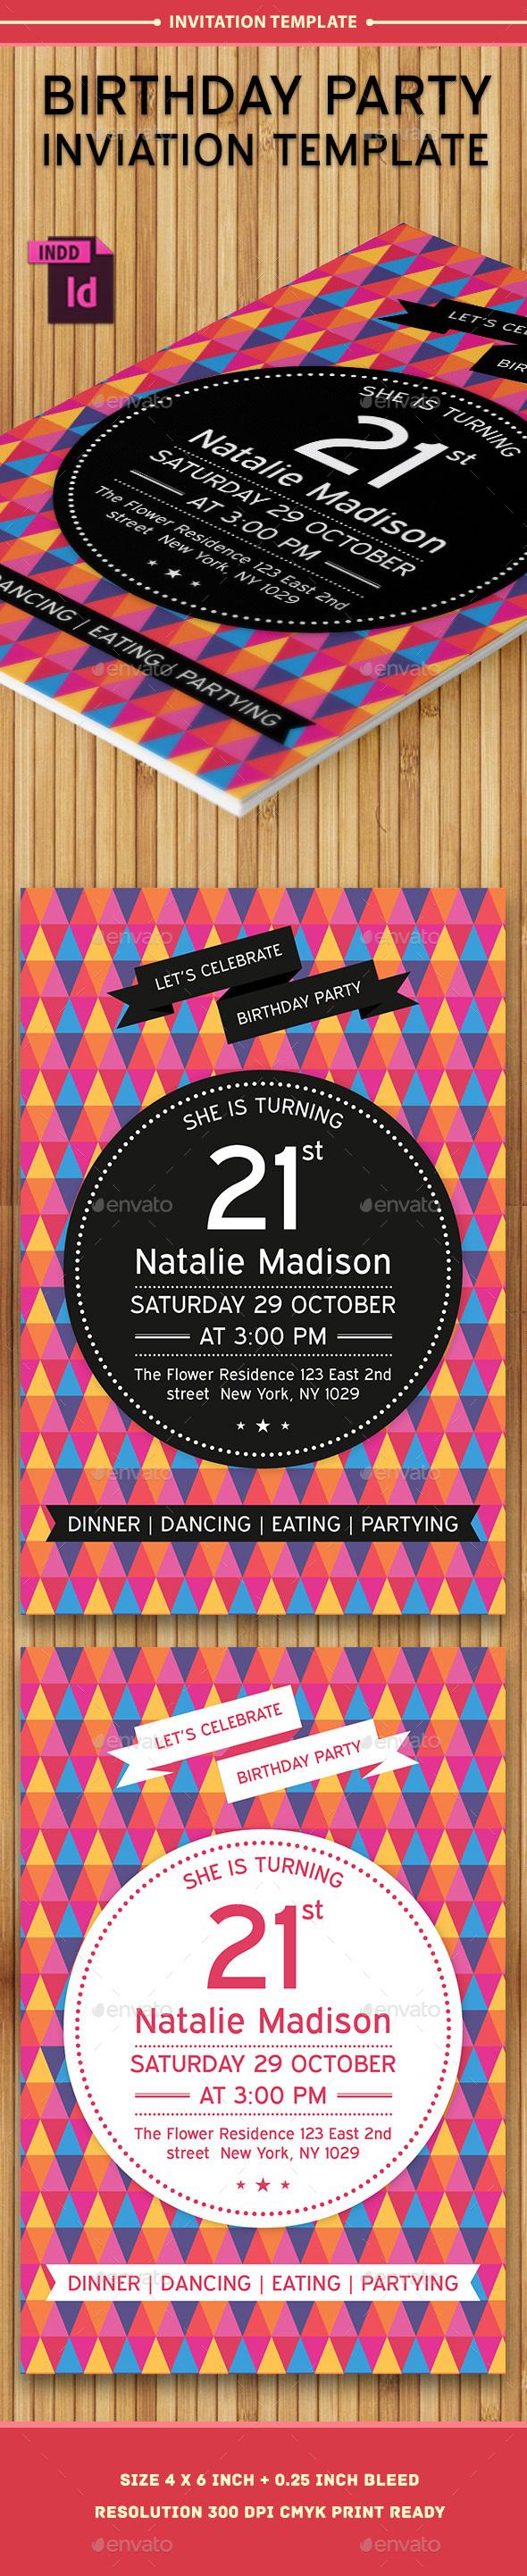 Birthday Party Invitation Template - Vol . 6 - Cards & Invites Print Templates